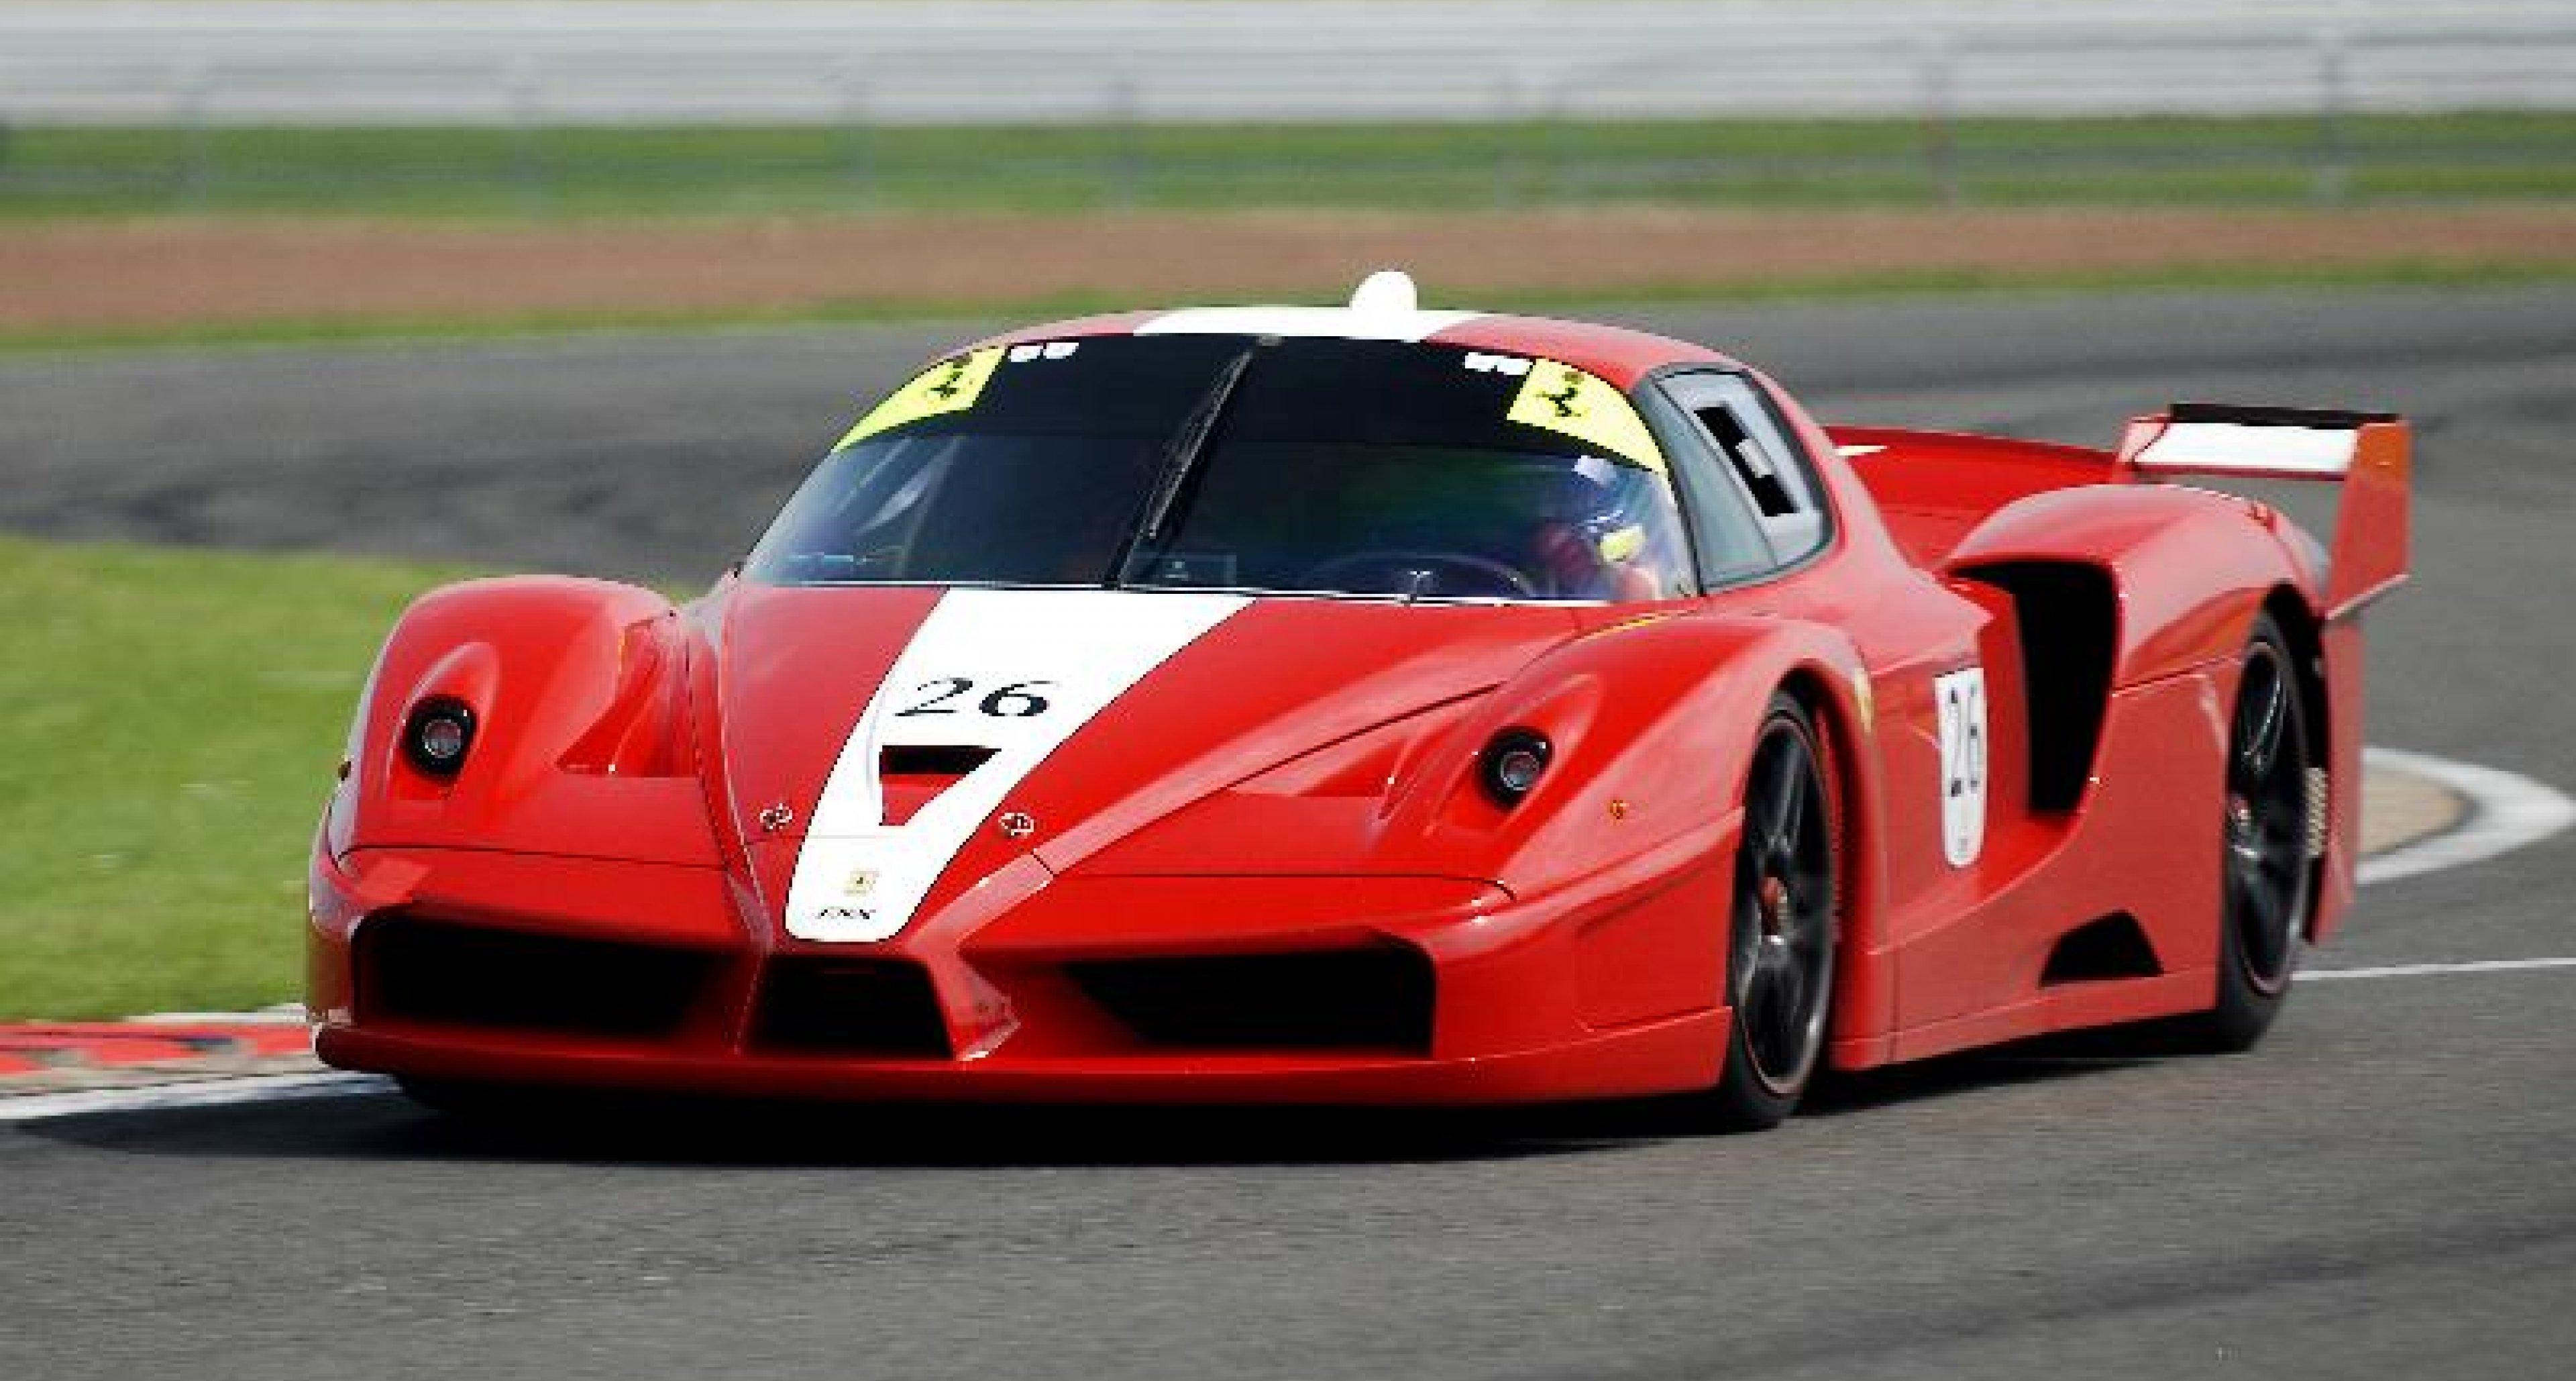 Ferrari Racing Days at Silverstone 2007